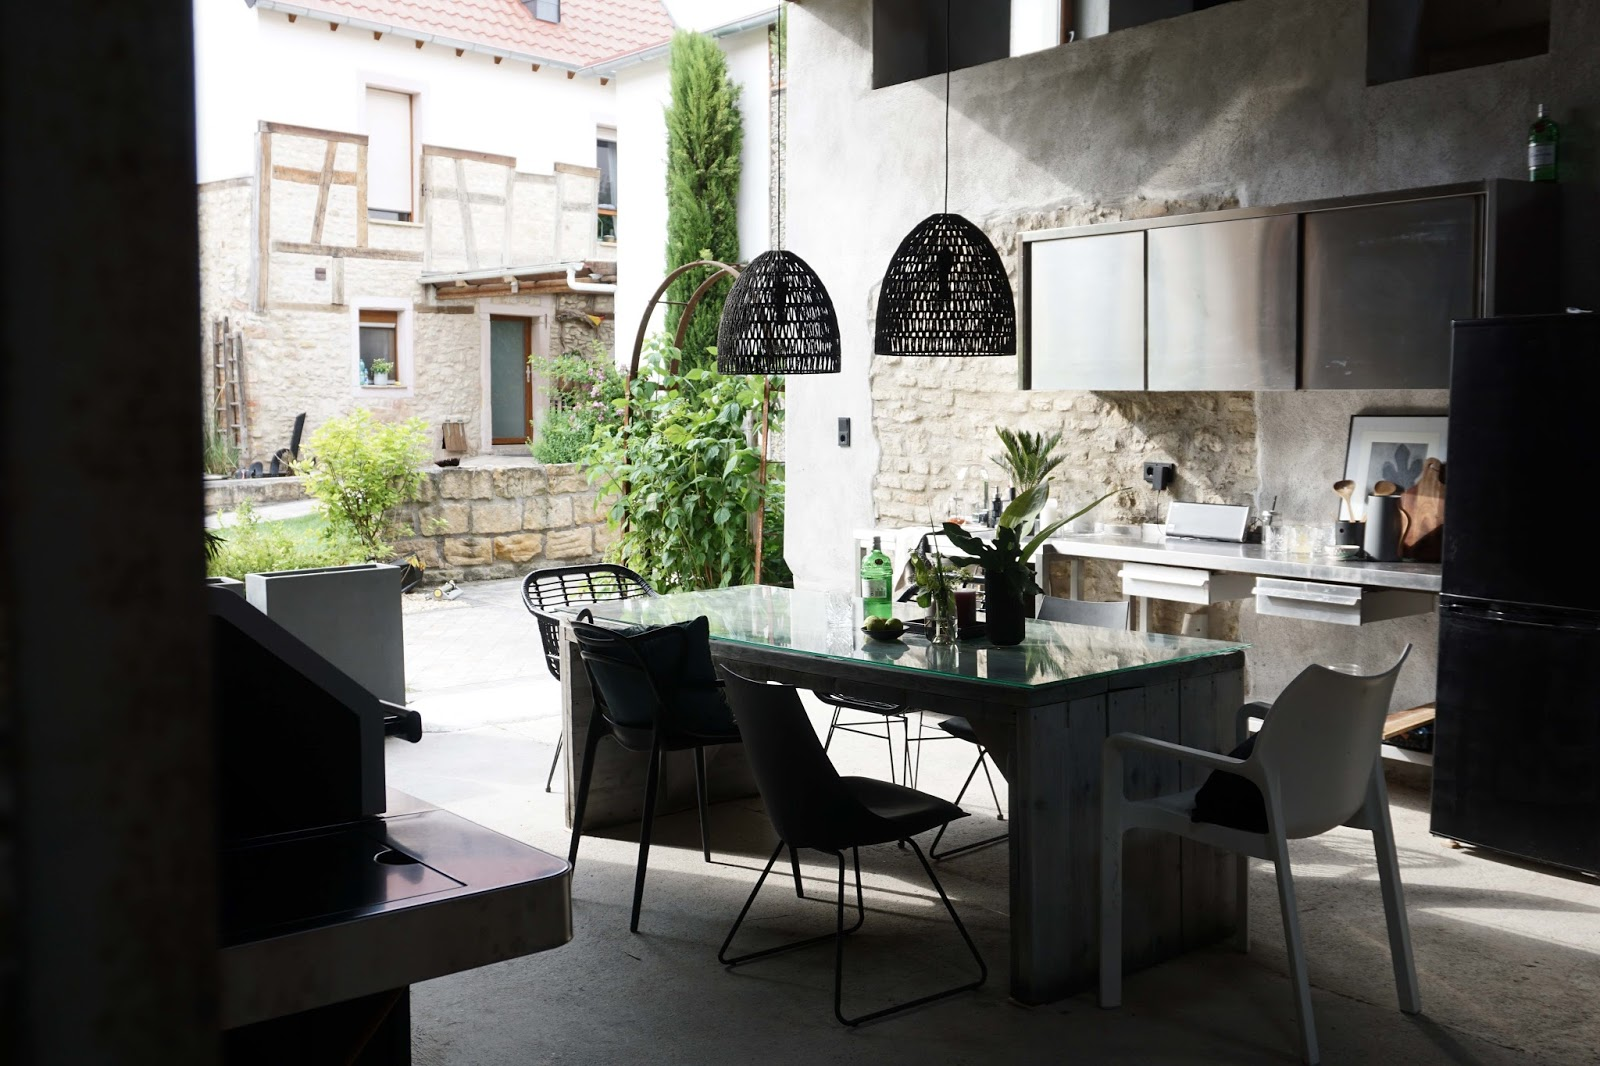 Außenküche - READY FOR SUMMER NIGHTS | S T I L R E I C H | BLOG